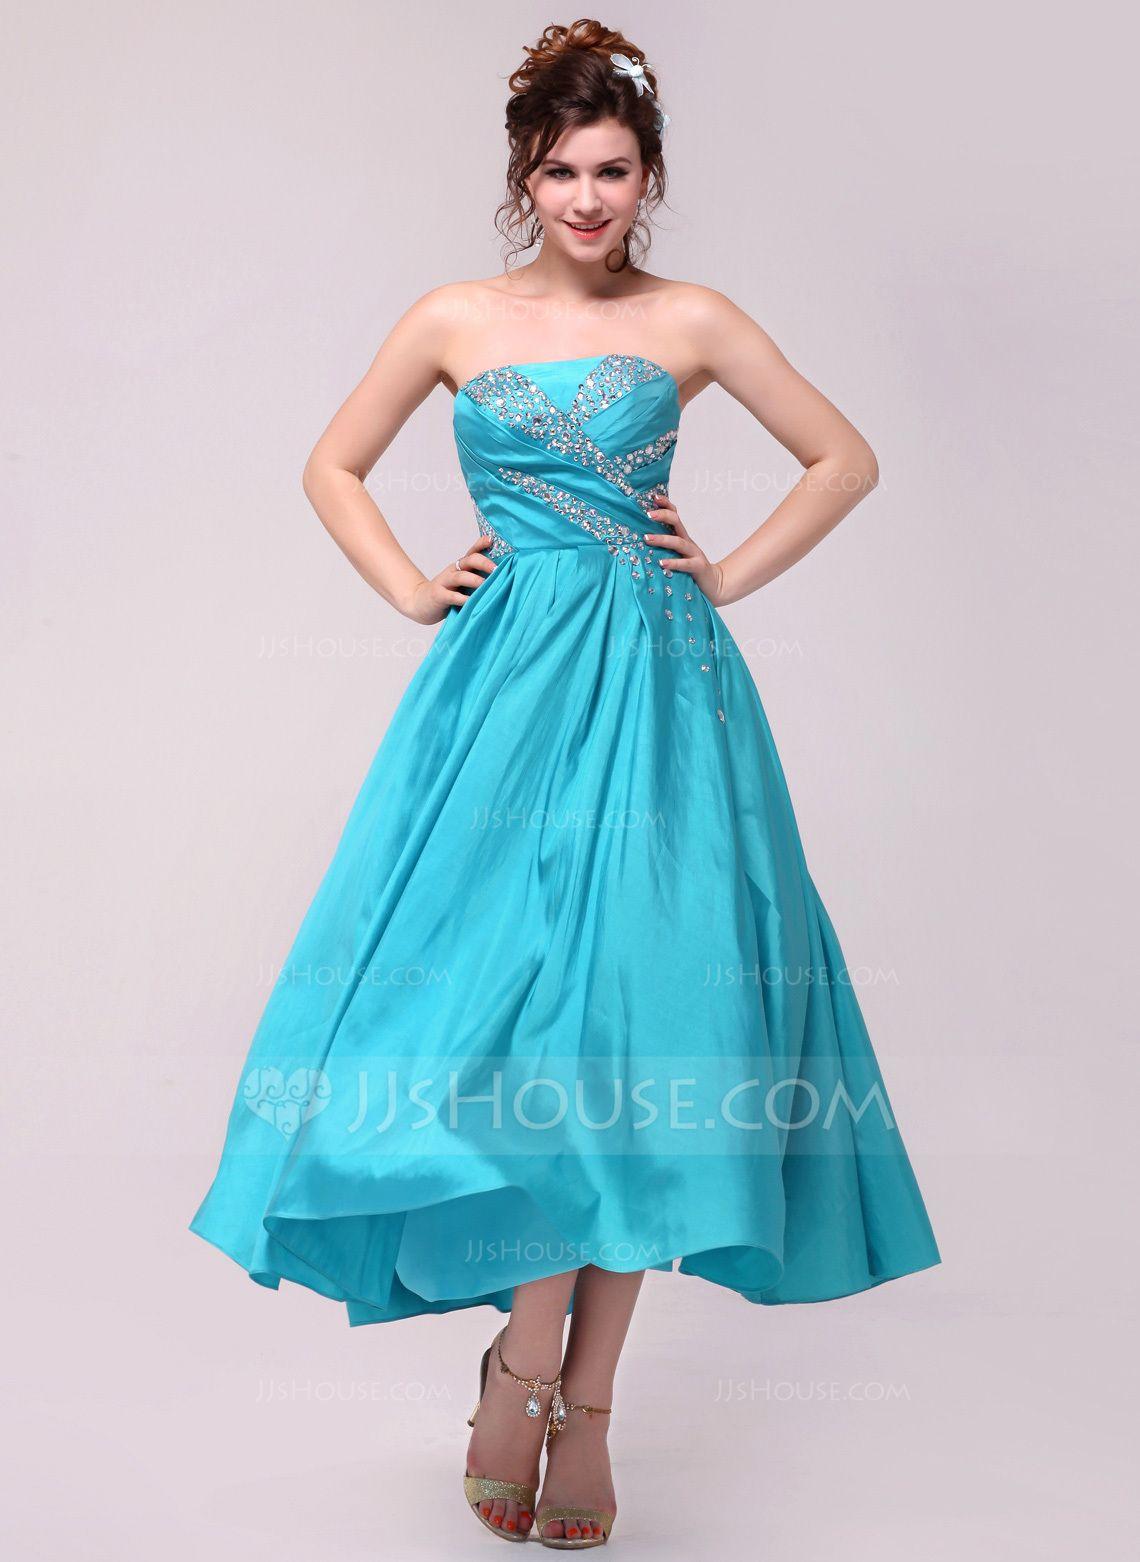 Alineprincess strapless anklelength taffeta prom dress with